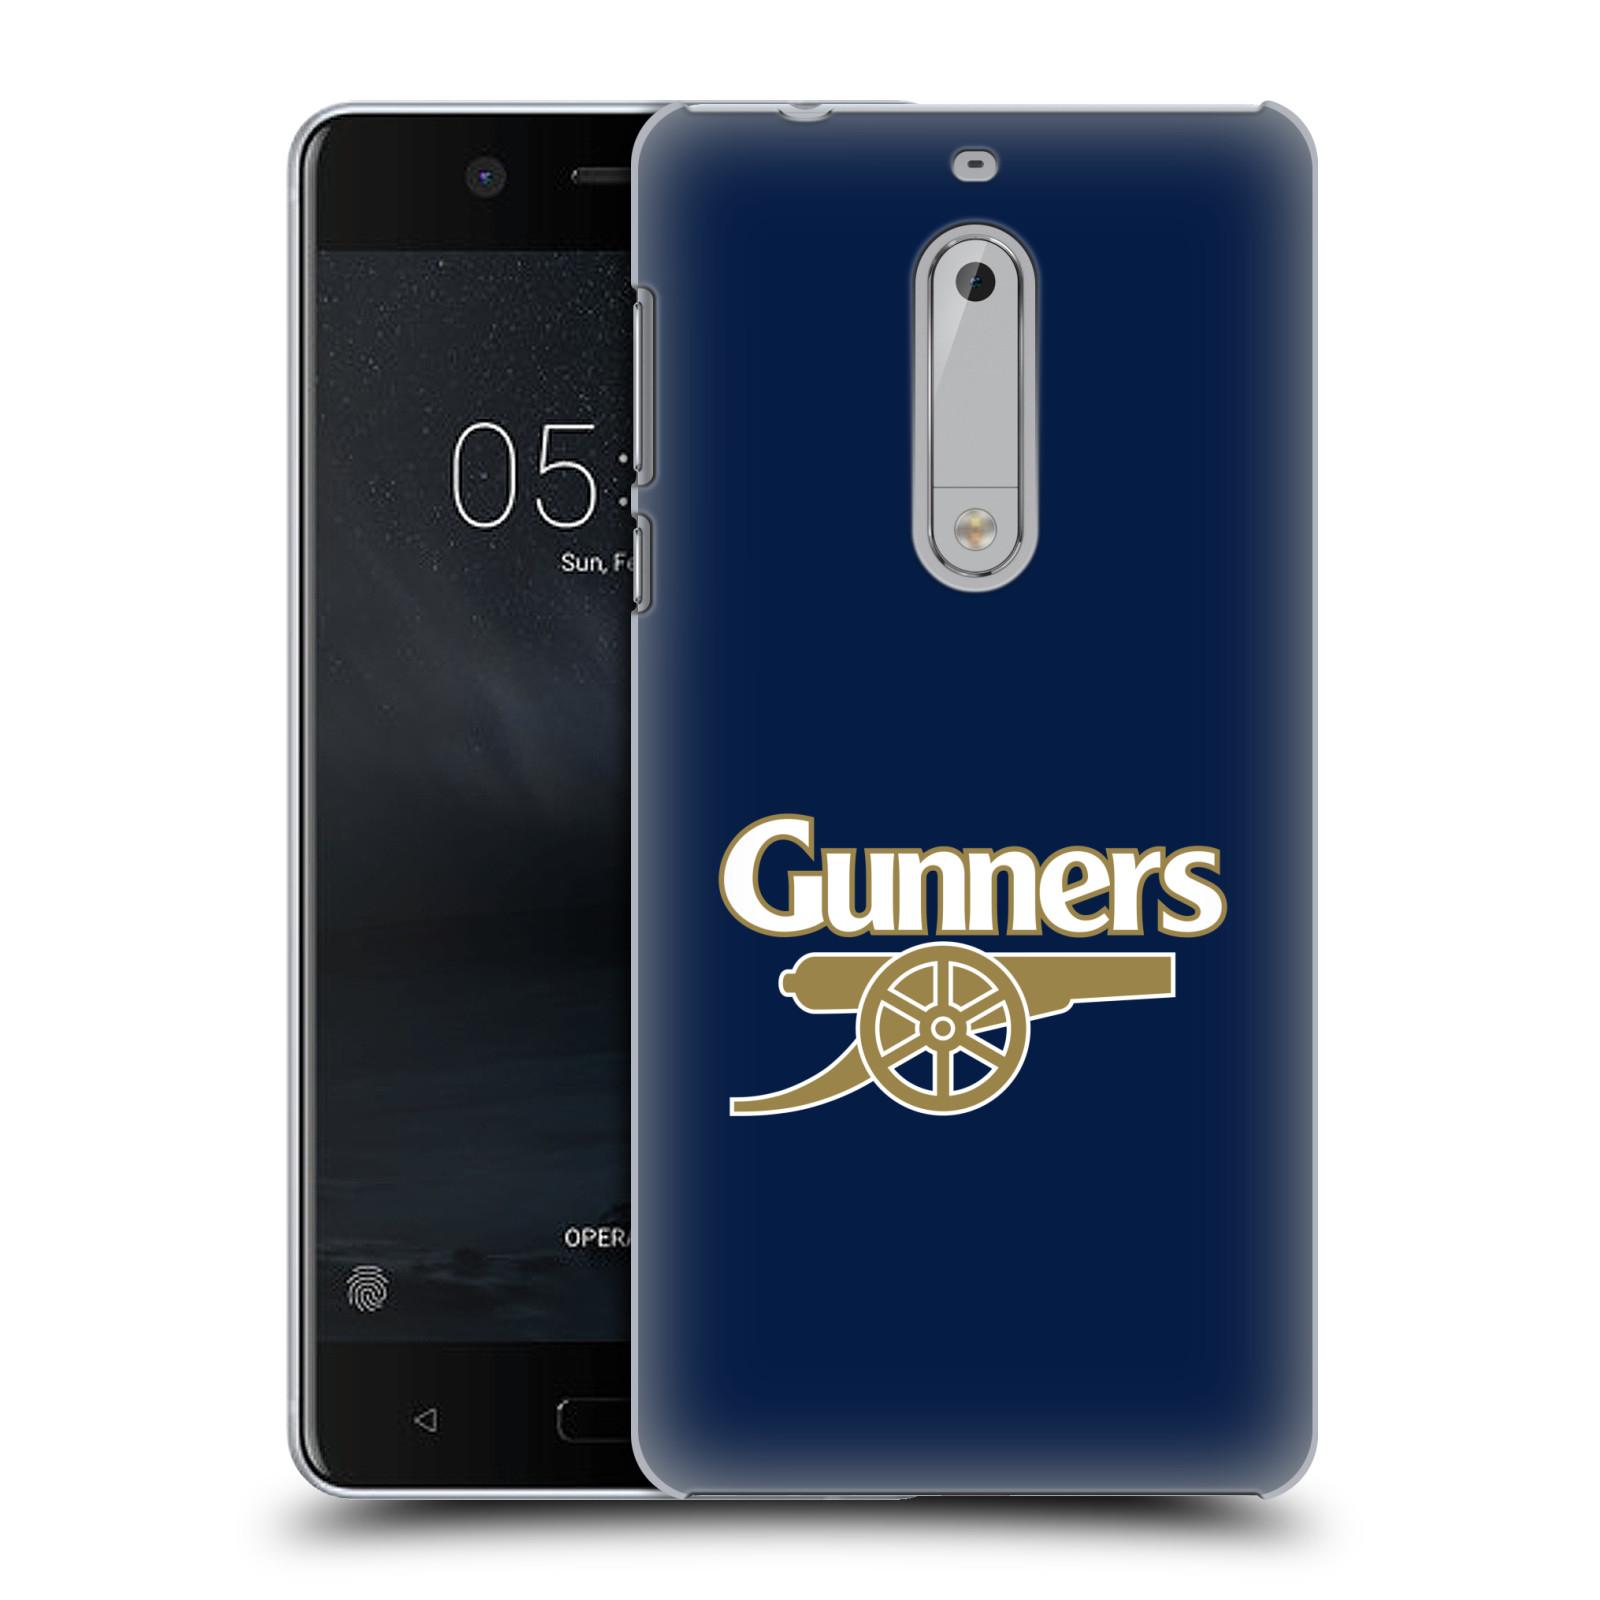 Plastové pouzdro na mobil Nokia 5 Head Case - Arsenal FC - Gunners